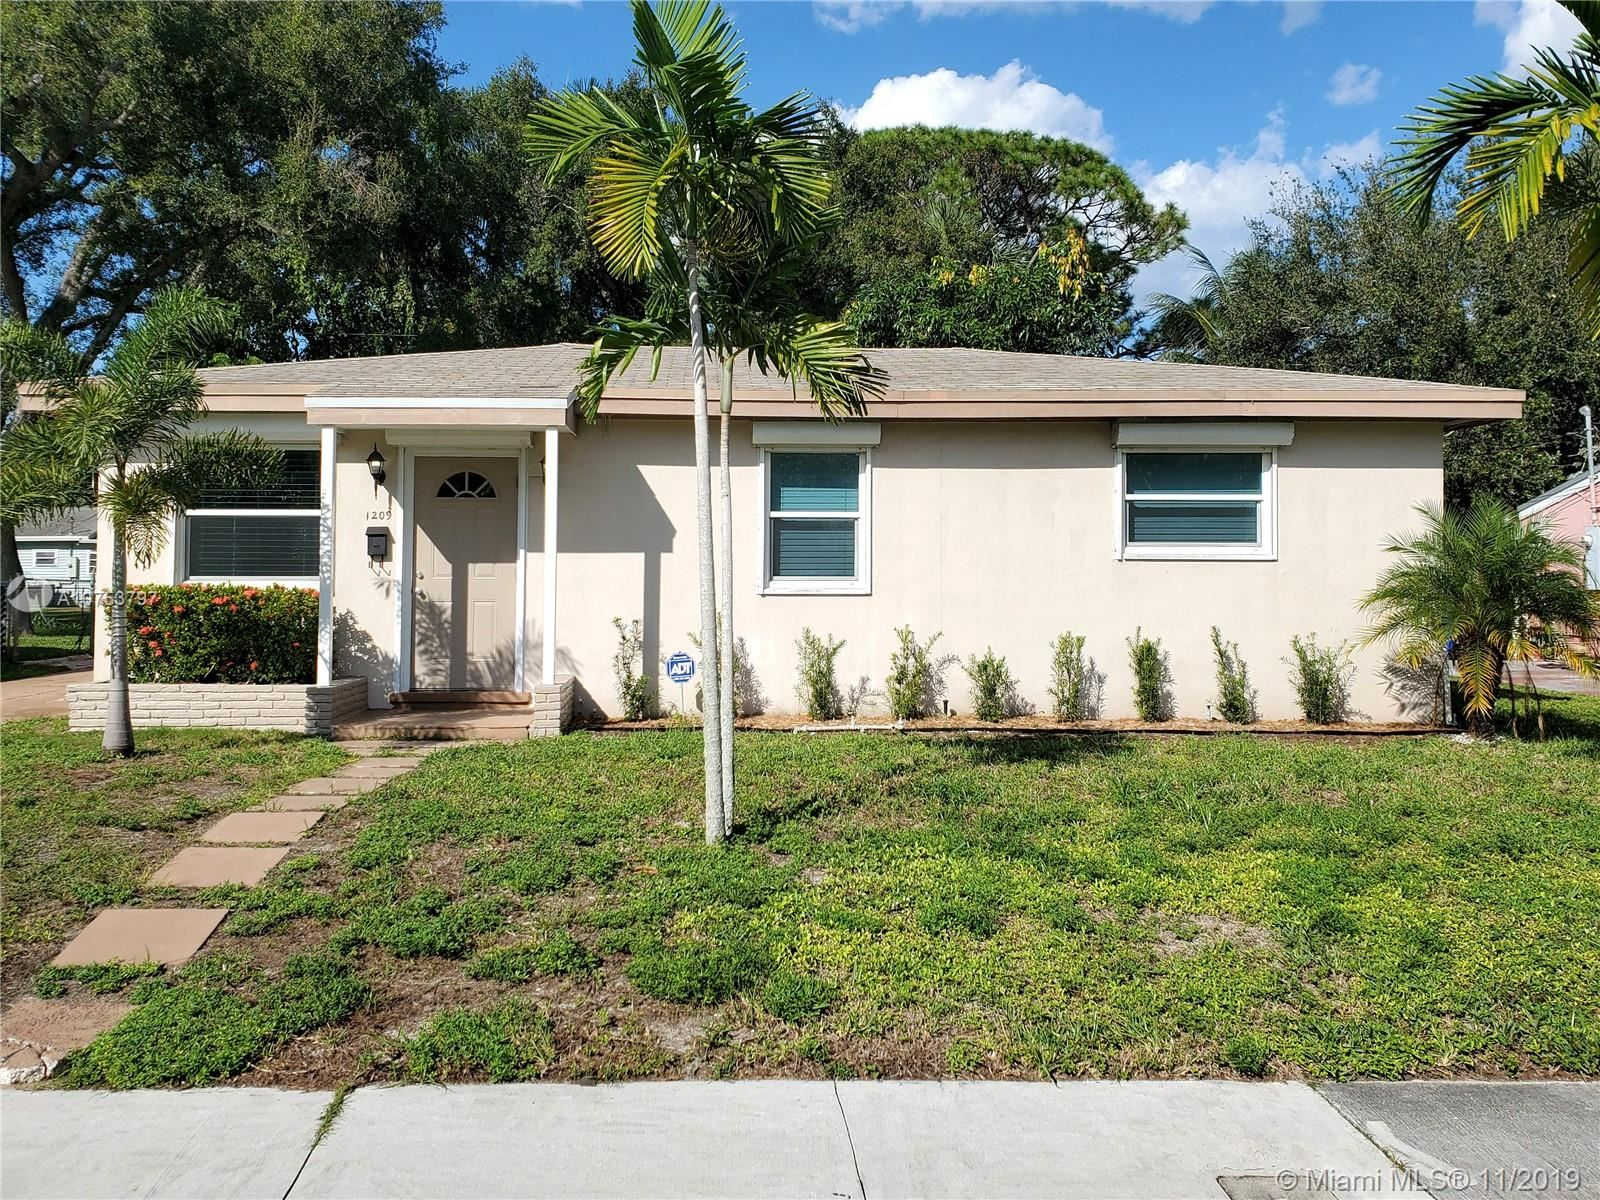 1209 SW 20TH STREET, Fort Lauderdale, FL 33315 - #: A10753797